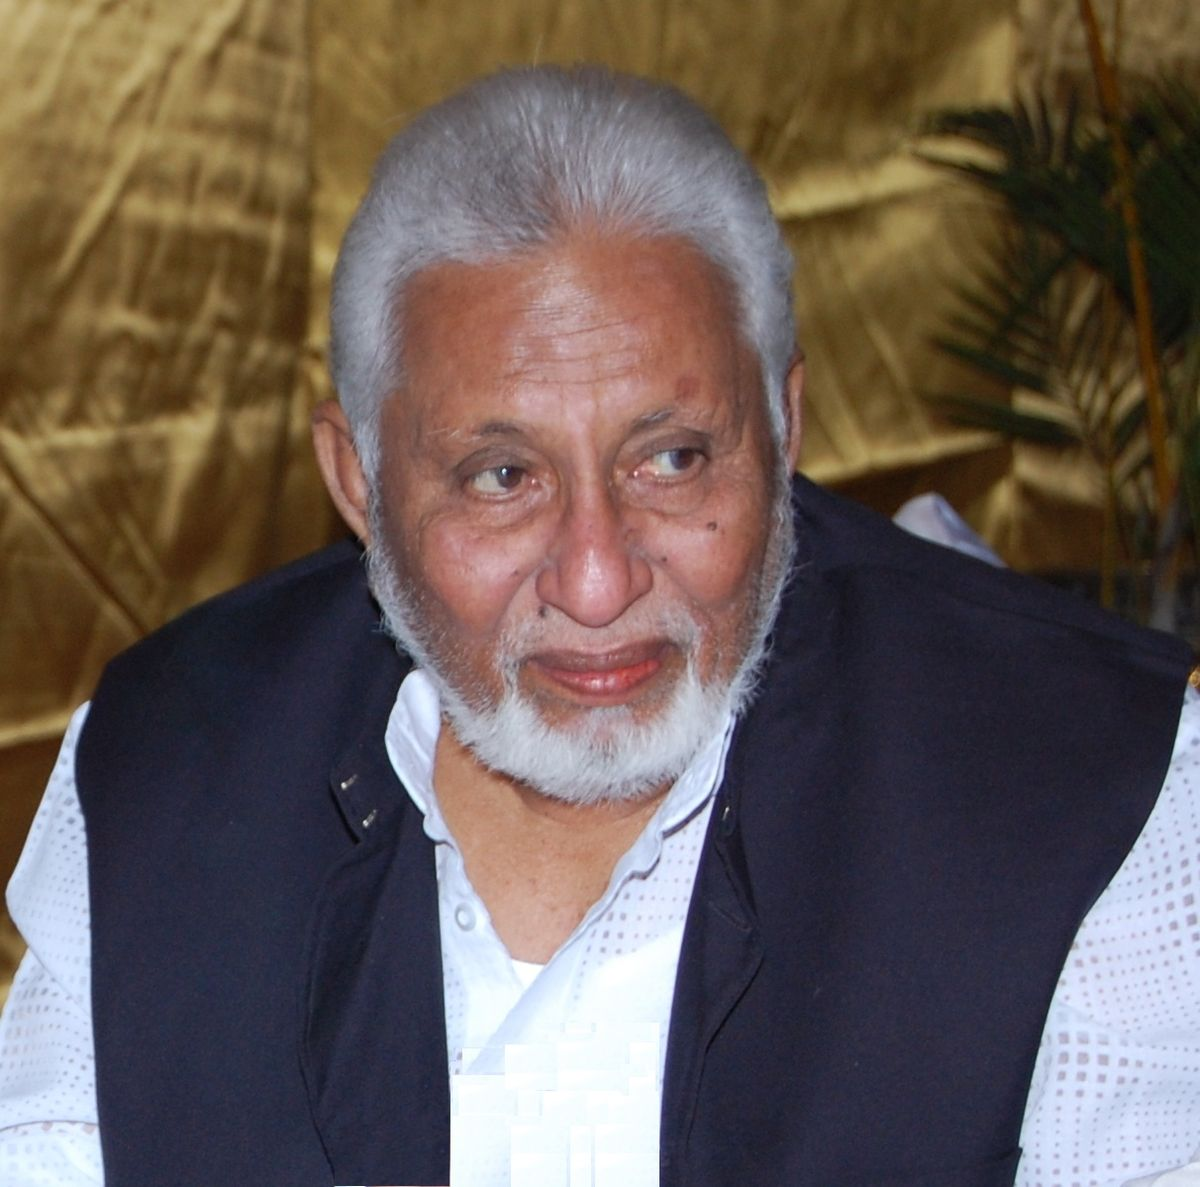 Abdul Samad Siddiqui Abdul Samad Siddiqui Wikipedia